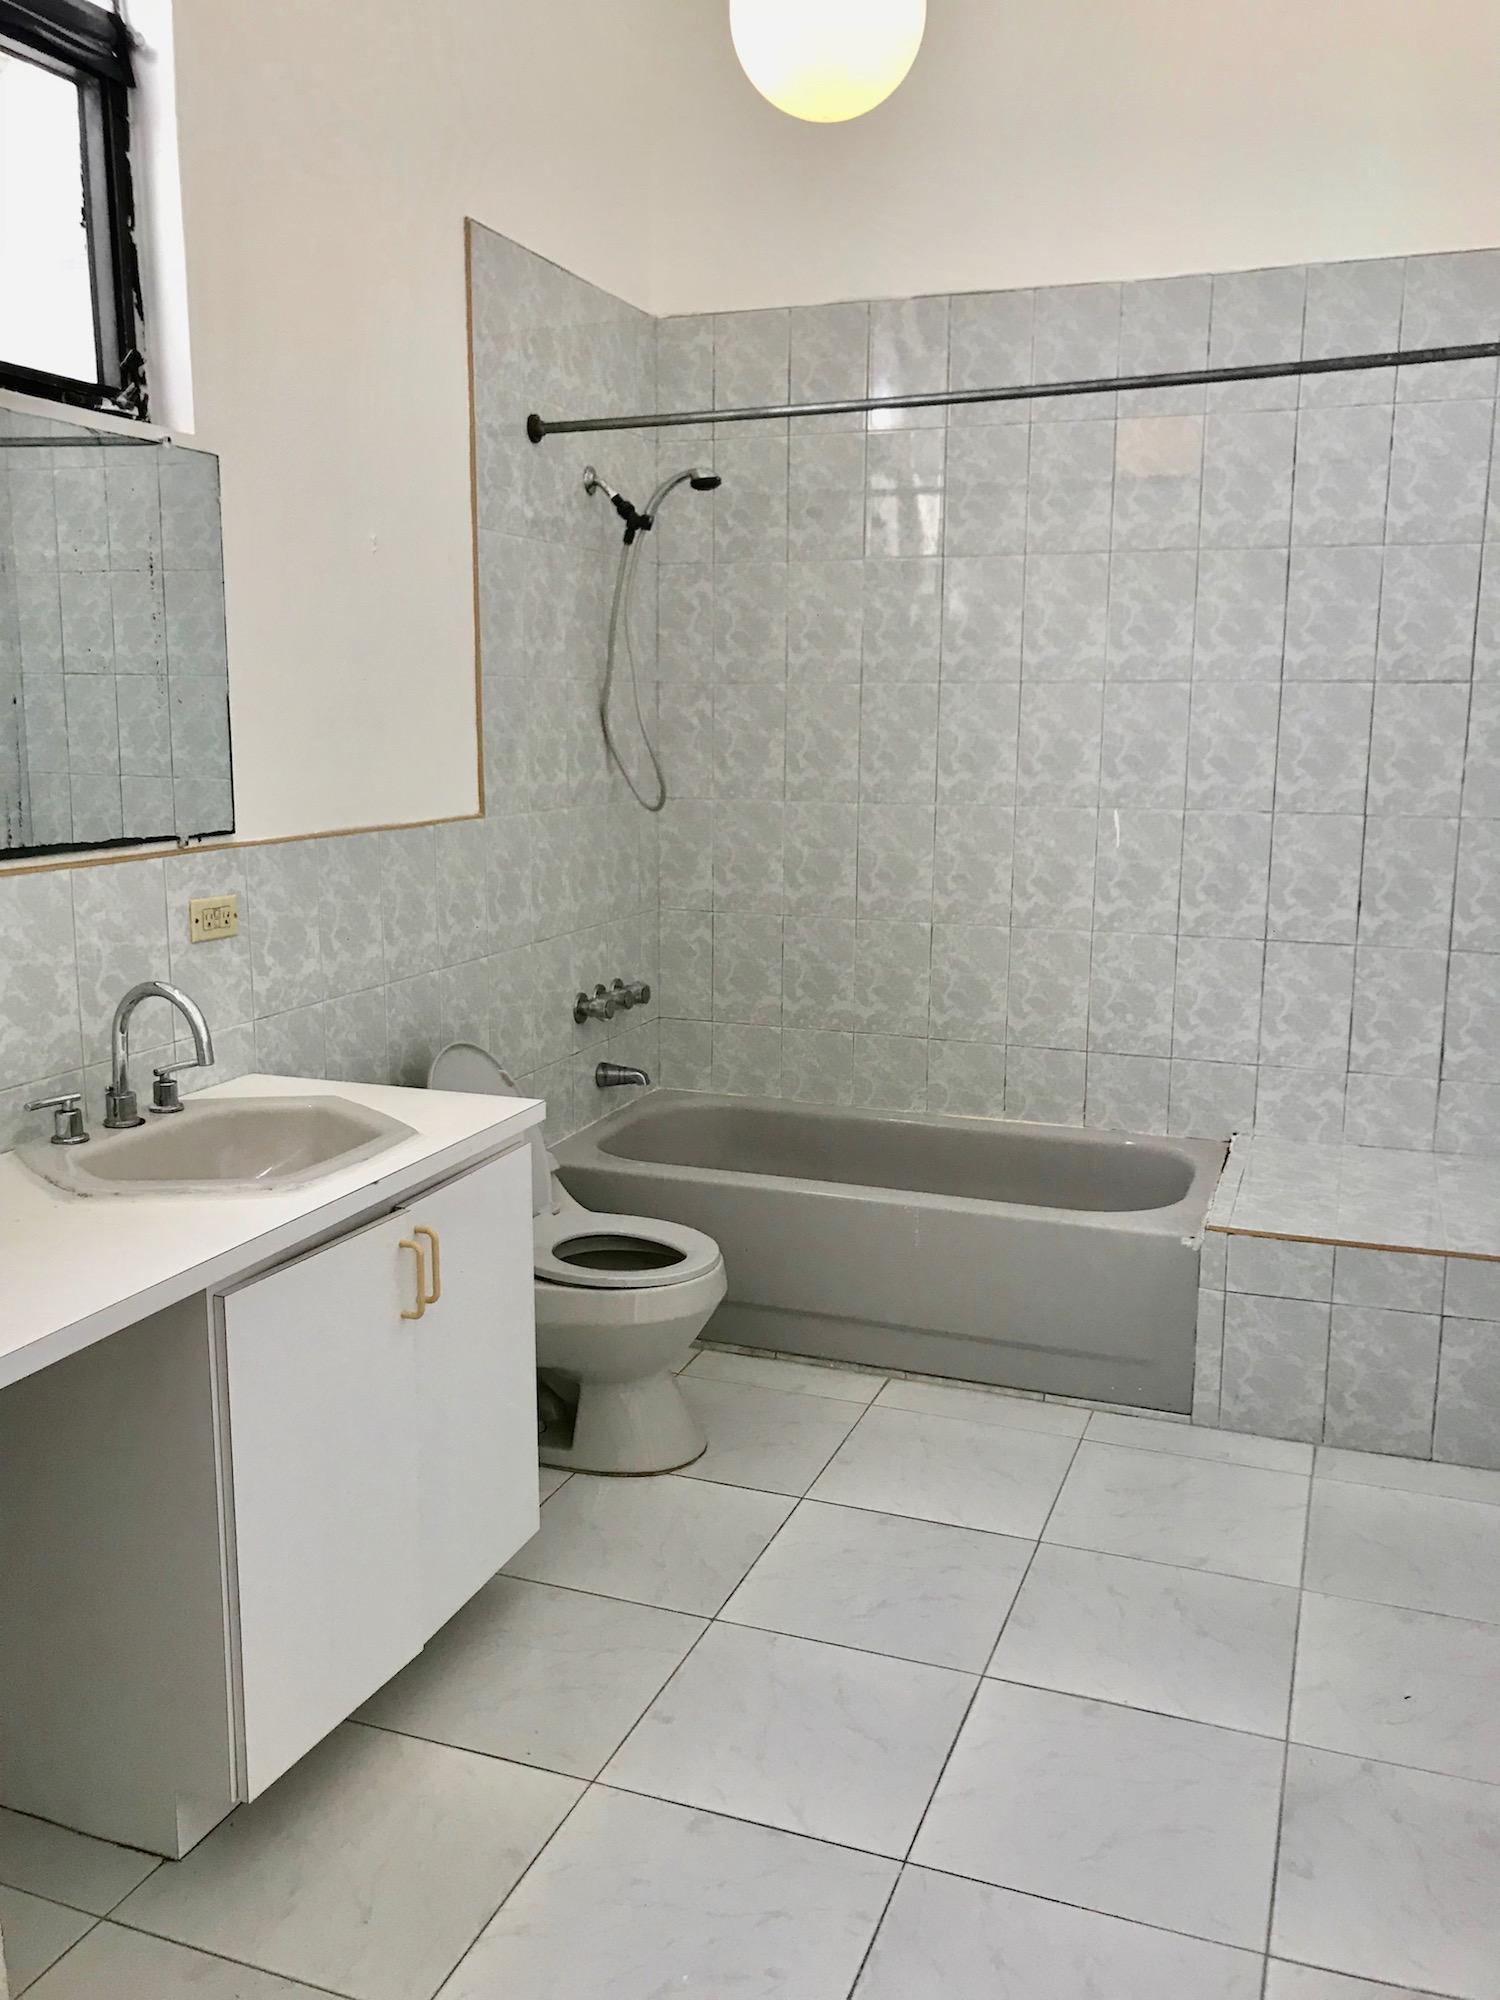 Apartment Bathroom 2